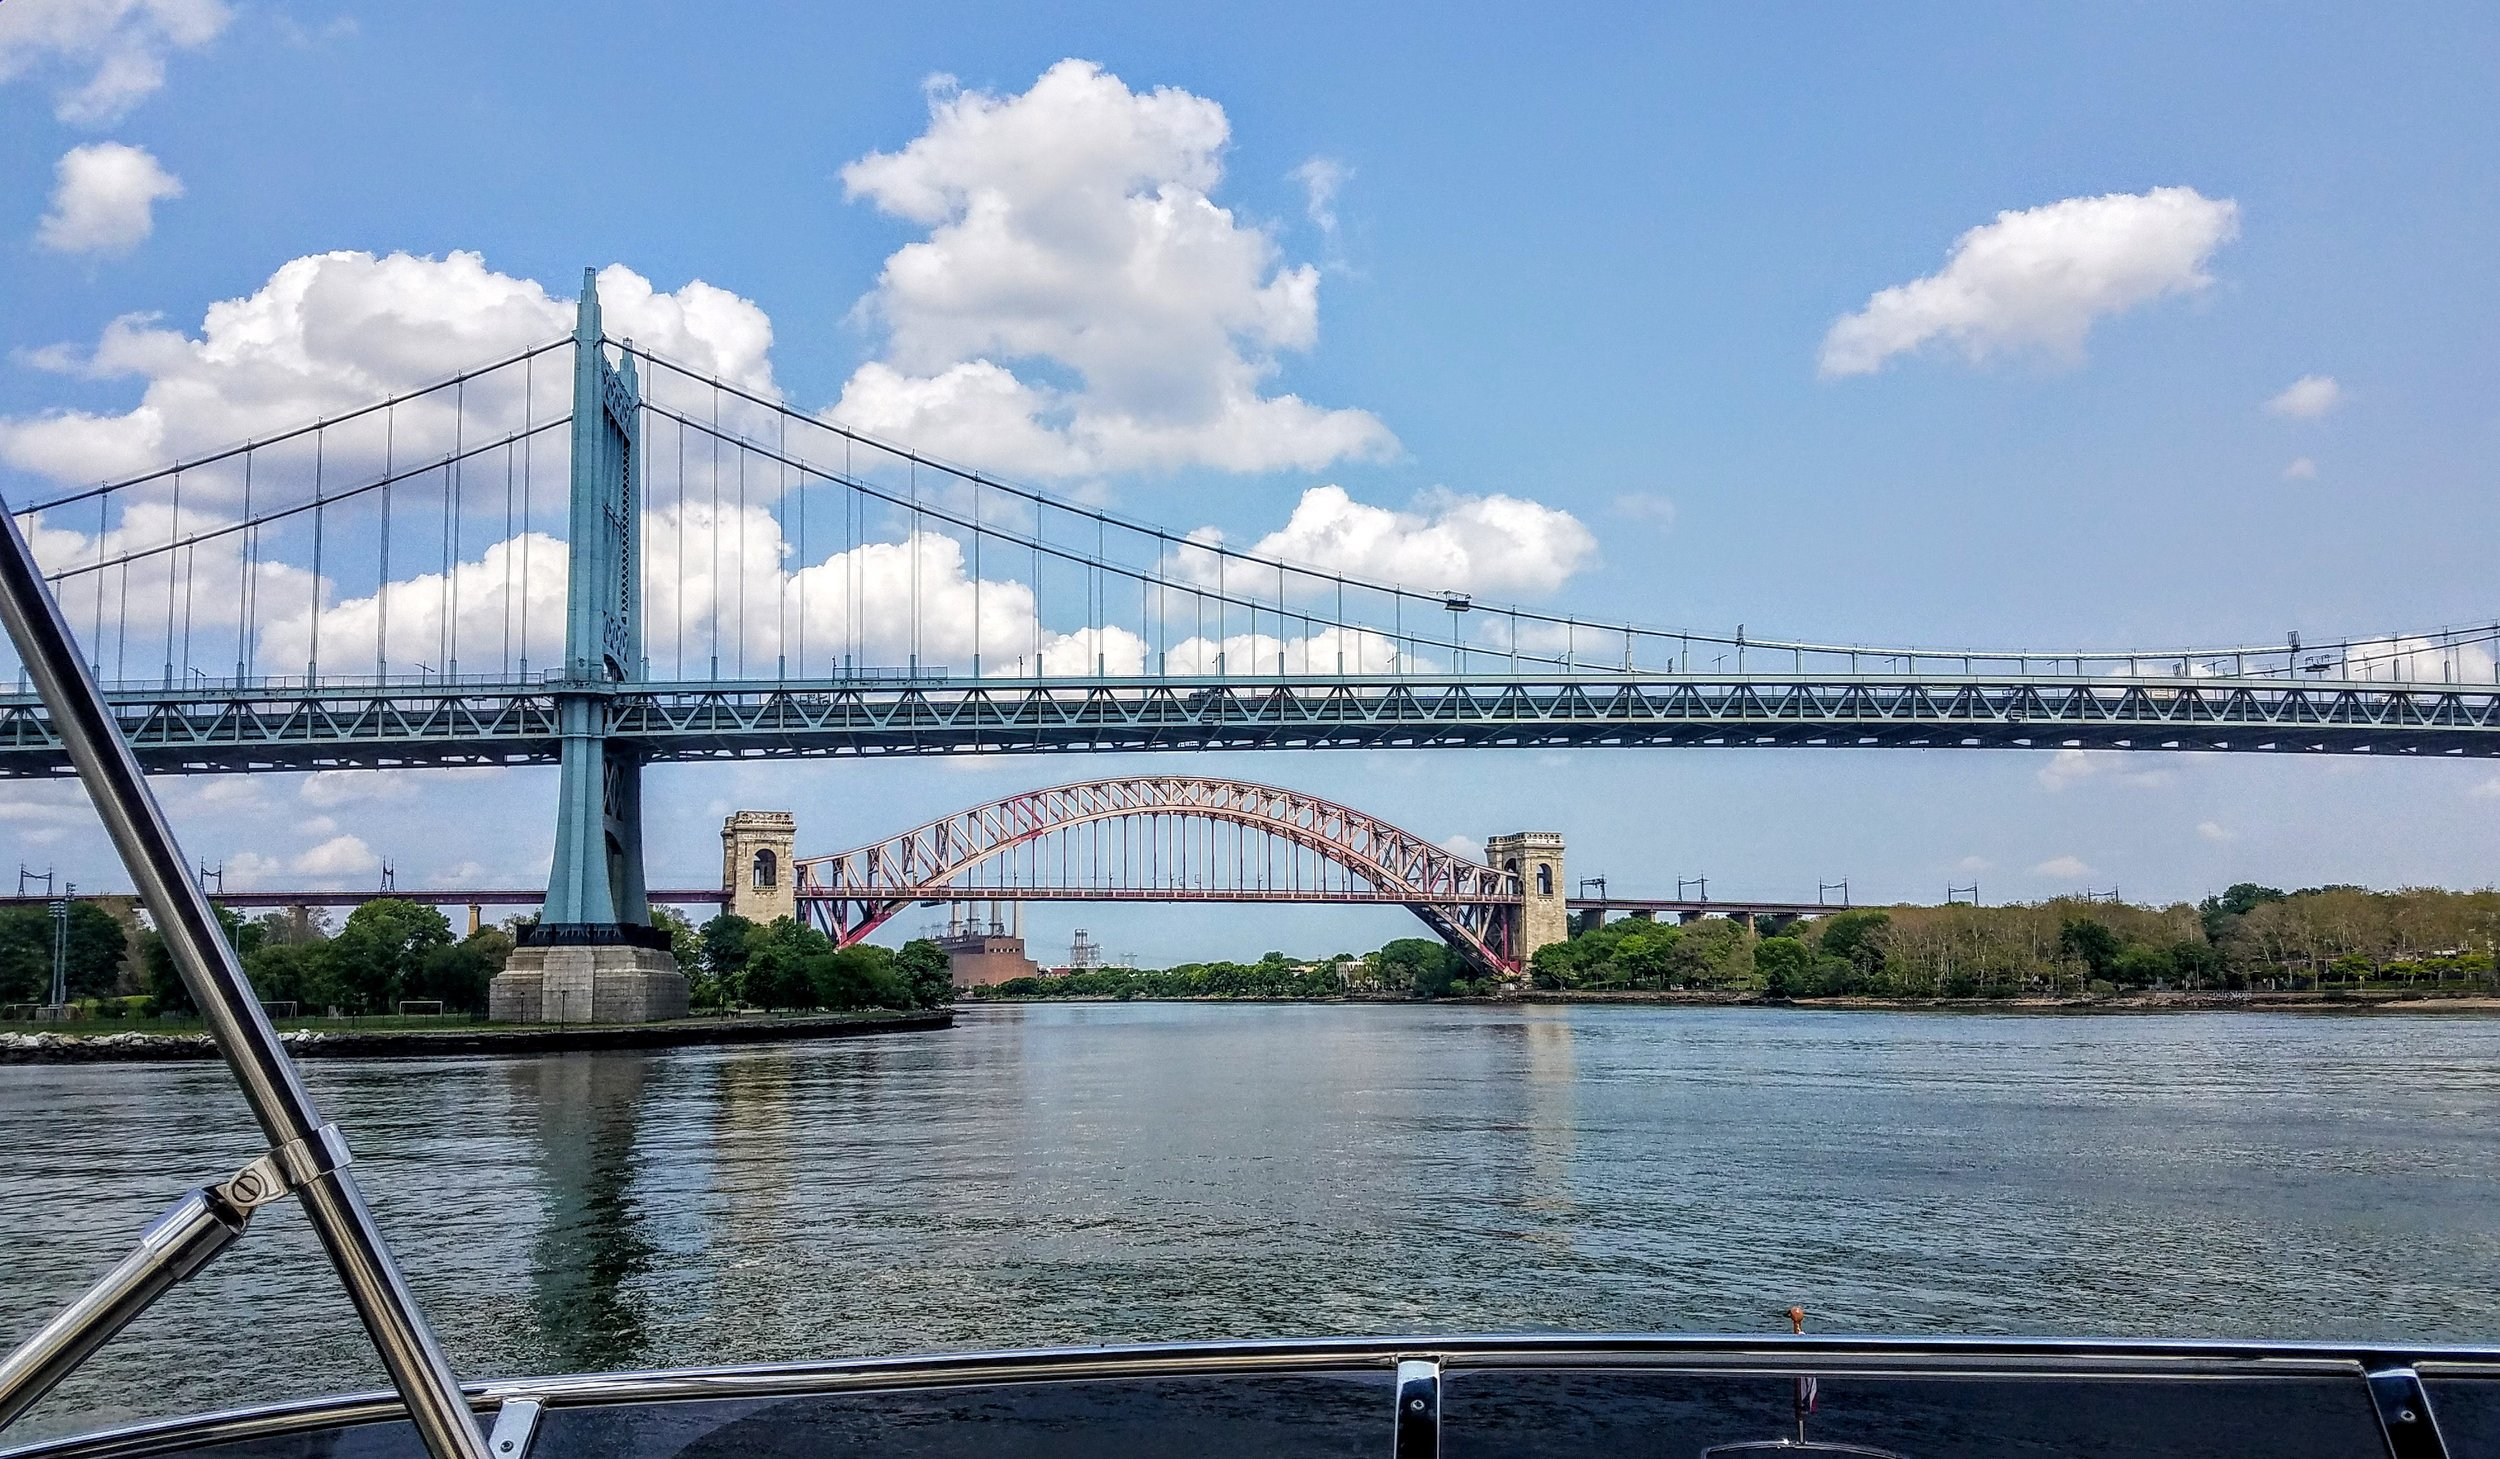 Robert F. Kennedy Bridge and Hell Gate Bridge